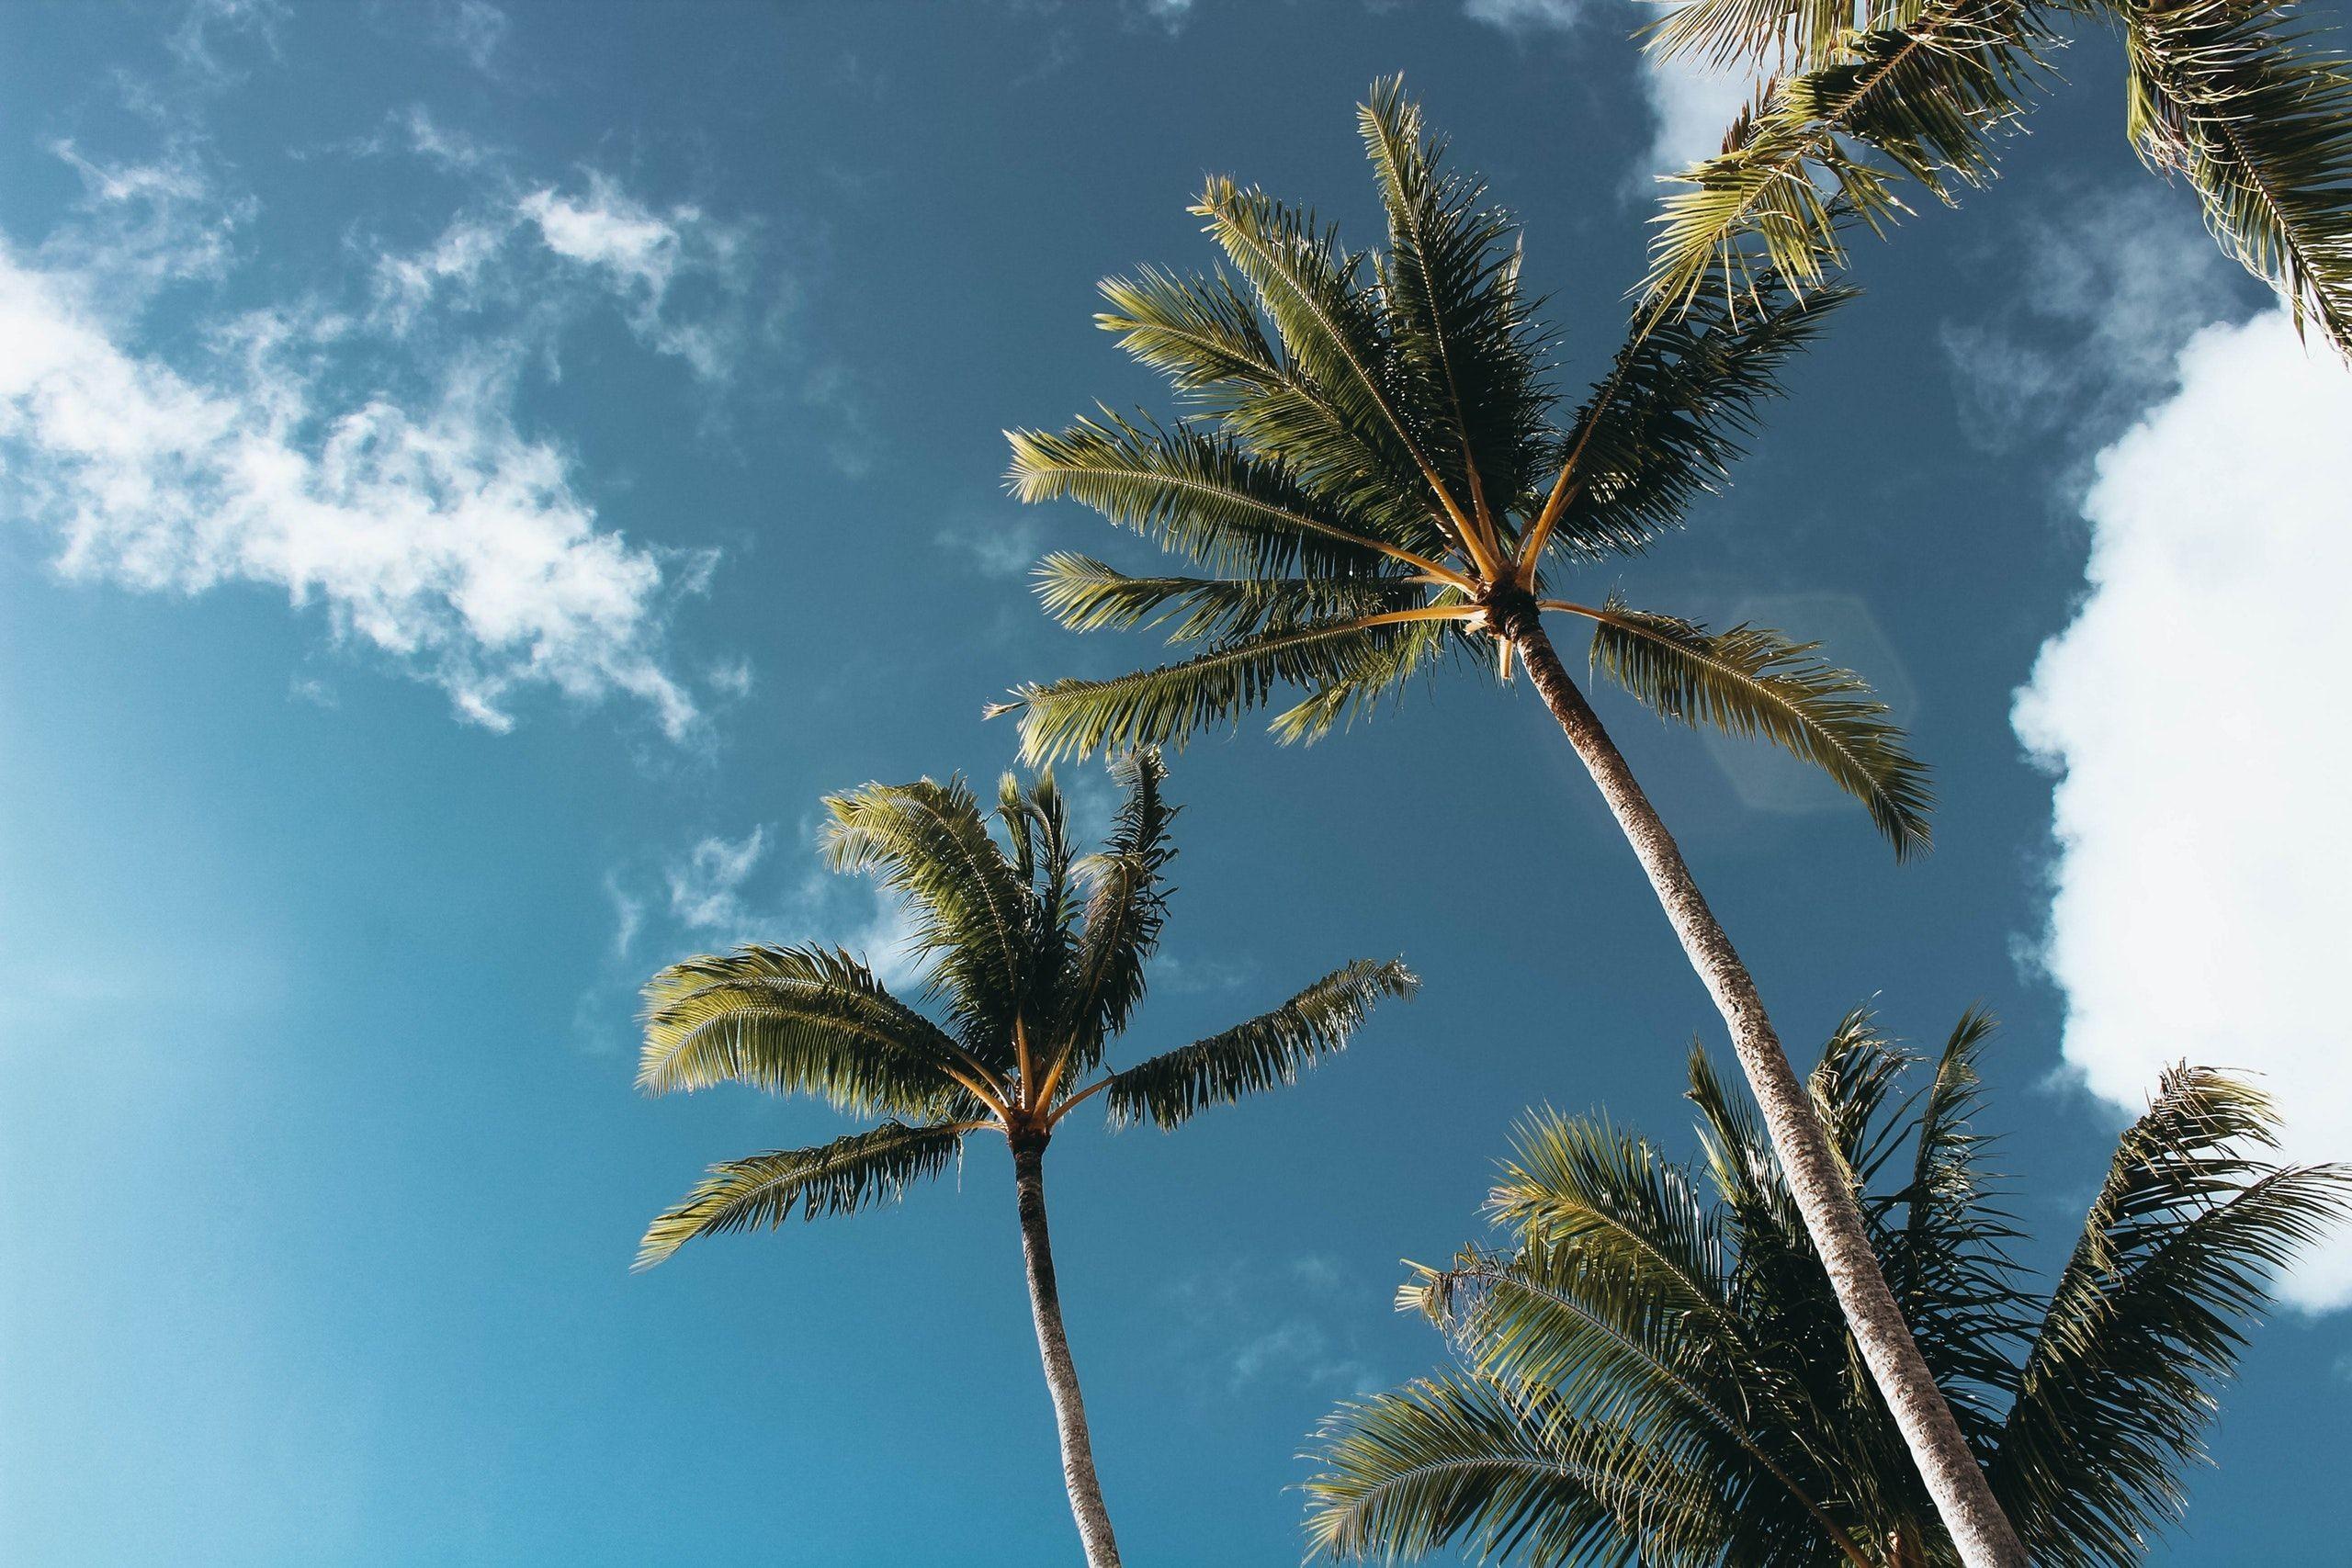 Daytime View Of California Palm Tree Wallpaper   Data - Palm Tree Wallpaper Hd - HD Wallpaper